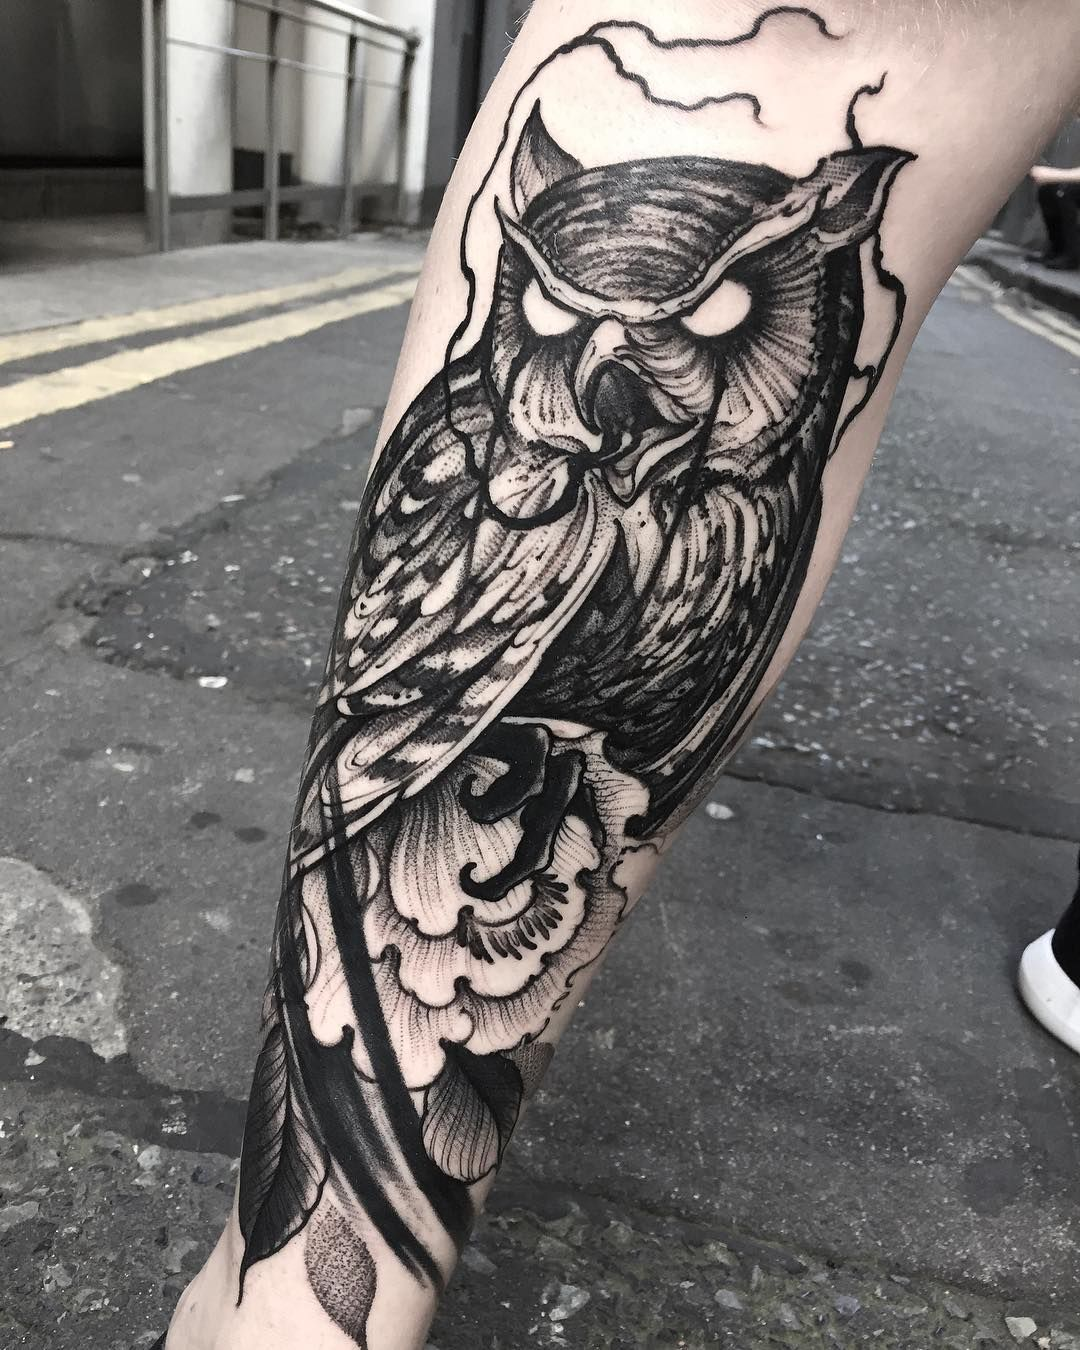 73 Best Owl Tattoos Design Ideas December 2020 Owl Tattoo Design Owl Tattoo Leg Tattoos